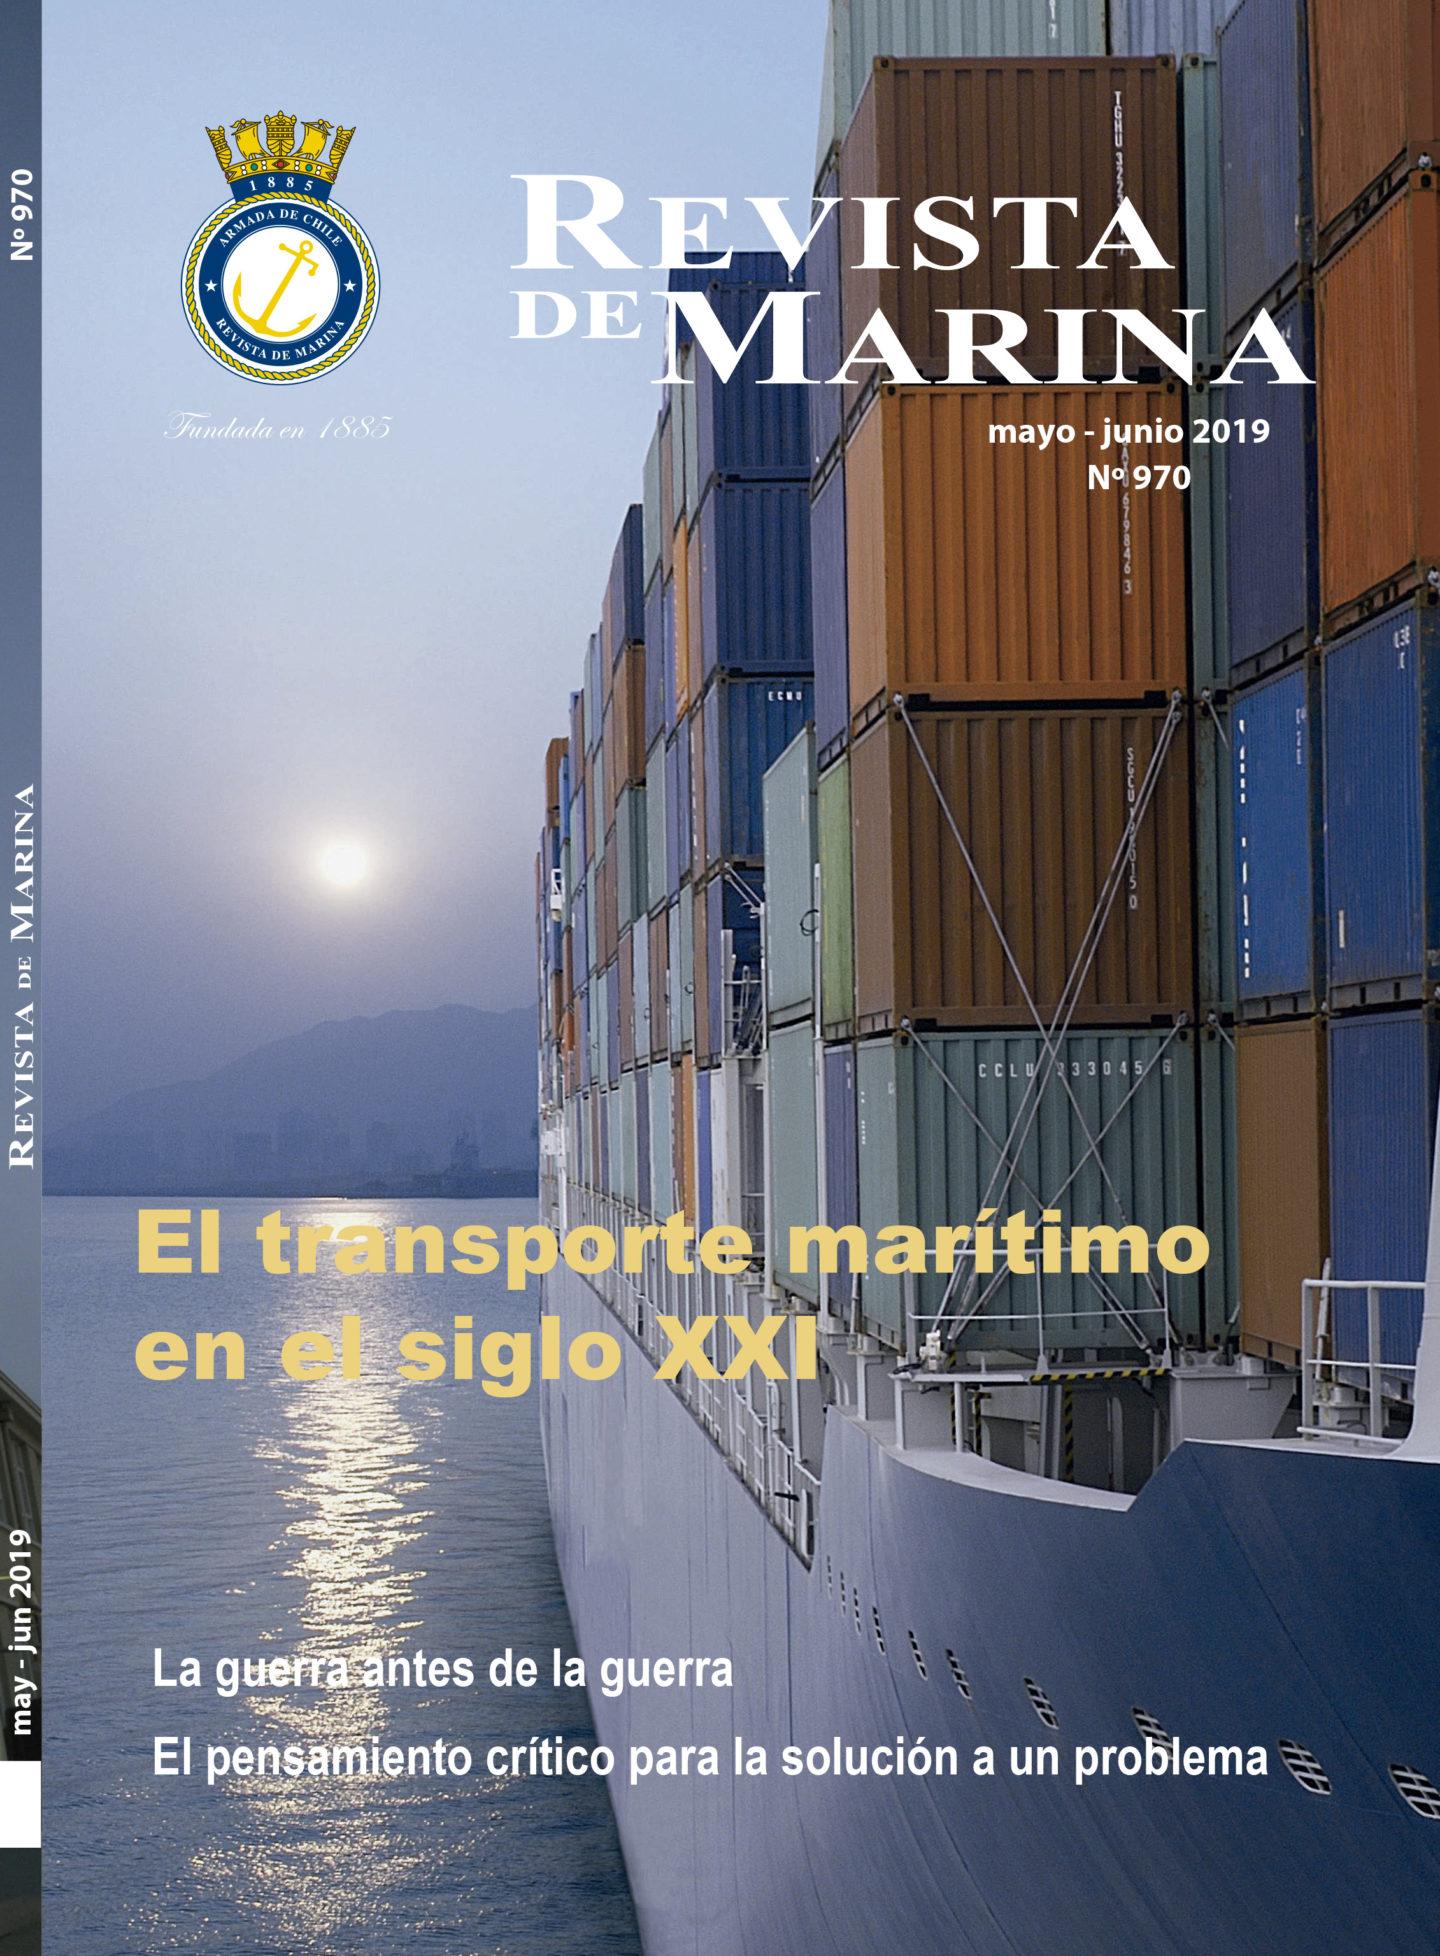 Última edición: Año CXXXIV, Volumen 136, Número 970